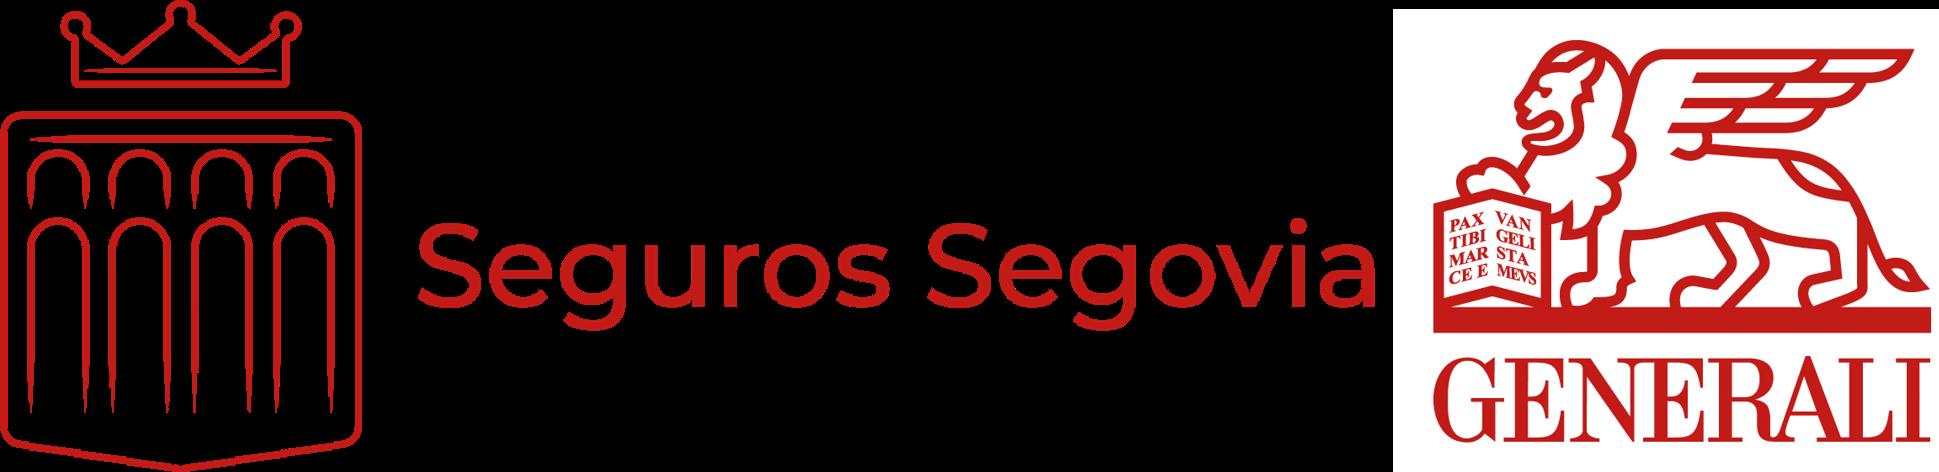 Seguros Segovia